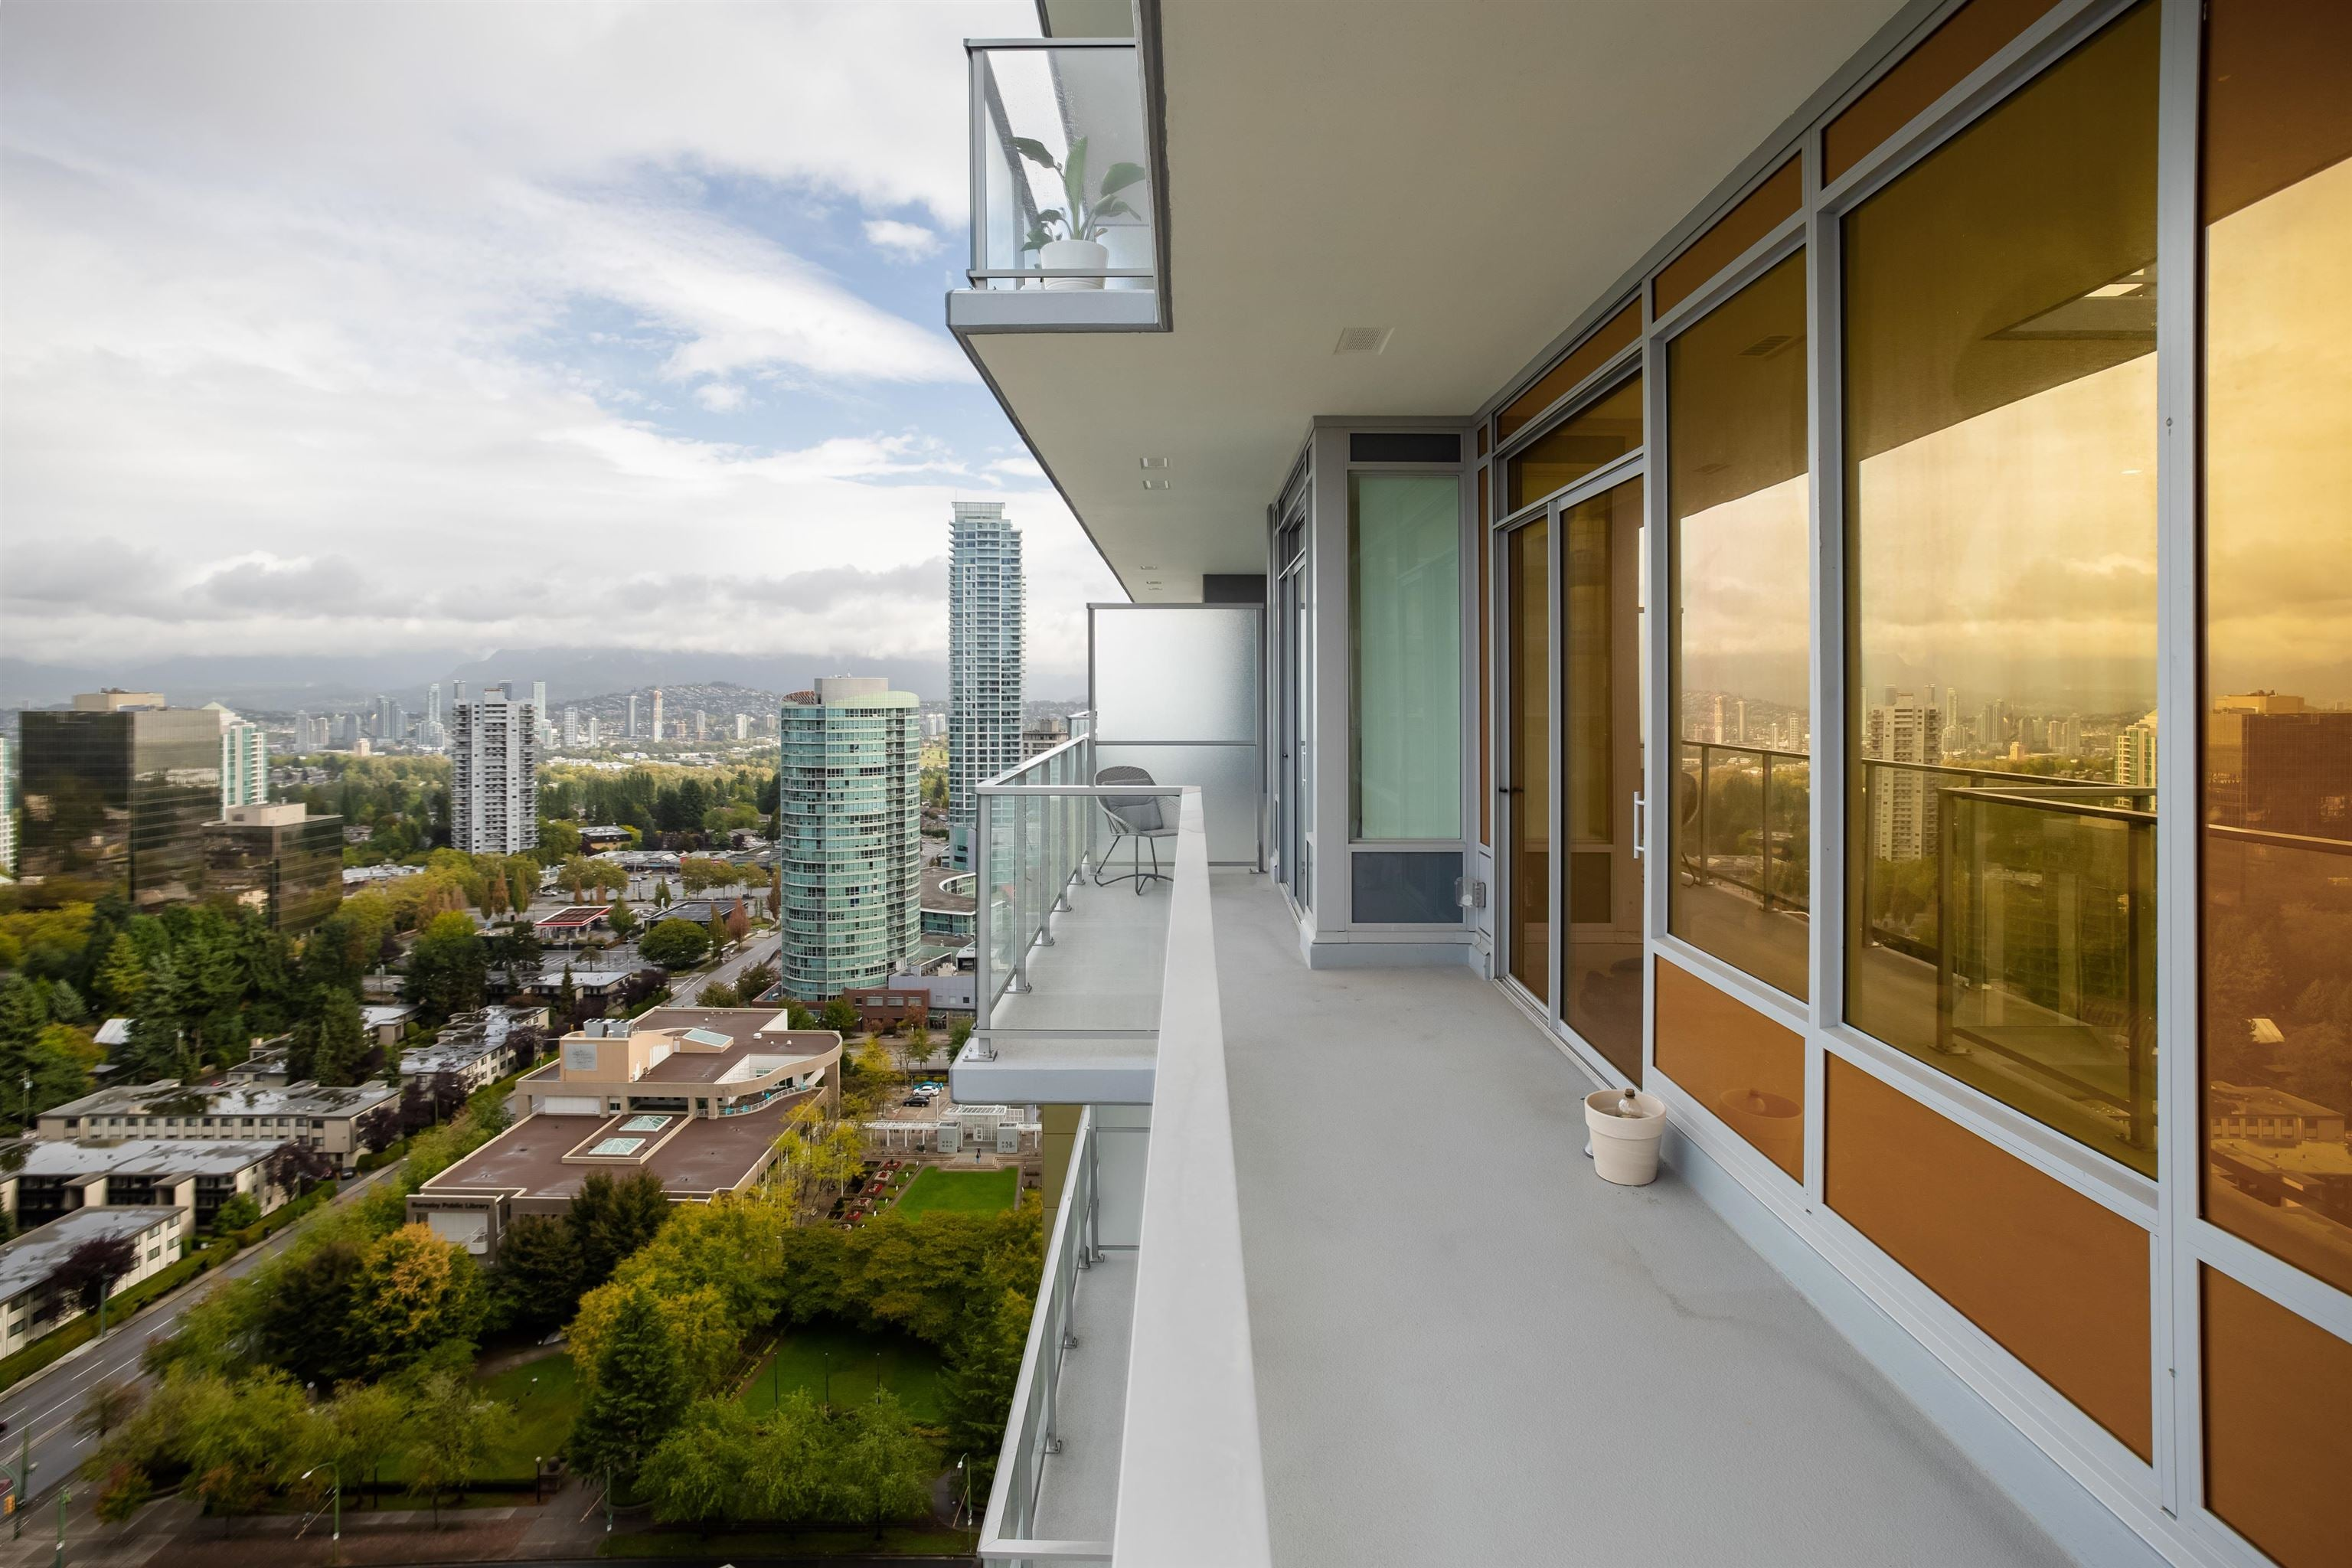 2206 6383 MCKAY AVENUE - Metrotown Apartment/Condo for sale, 2 Bedrooms (R2625647) - #24